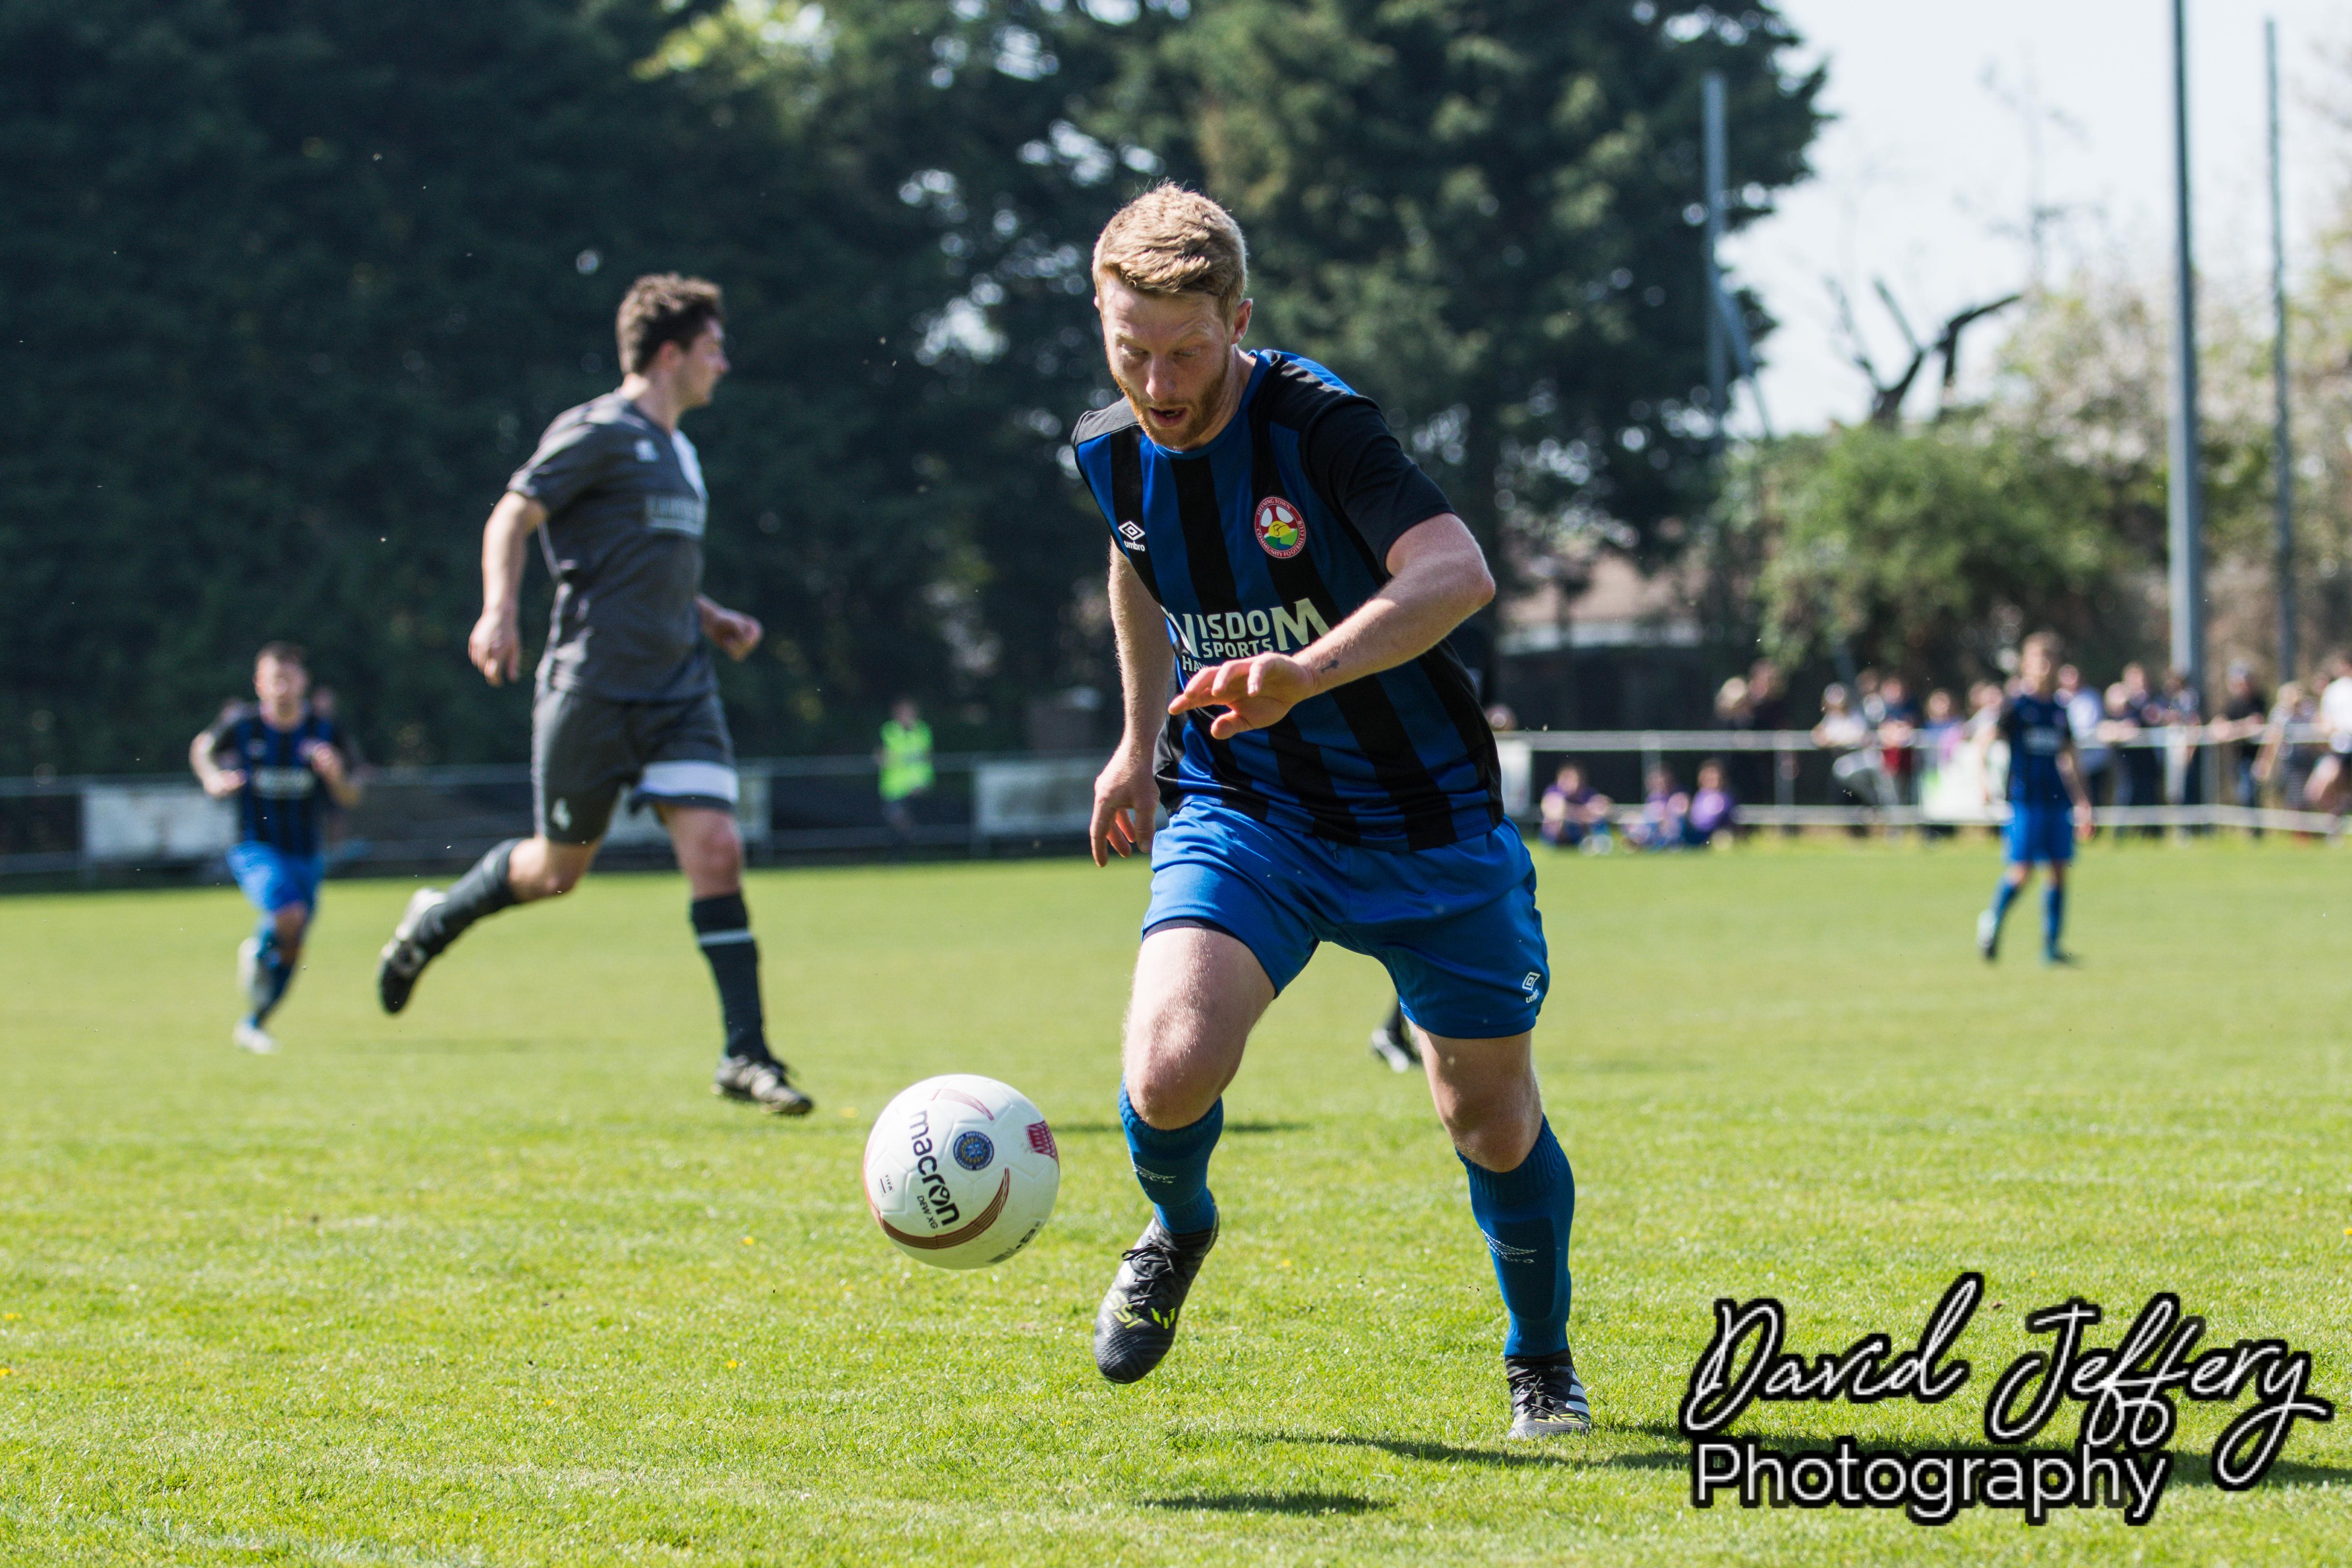 034 Steyn vs Wick, Div1 Cup Final DAVID_